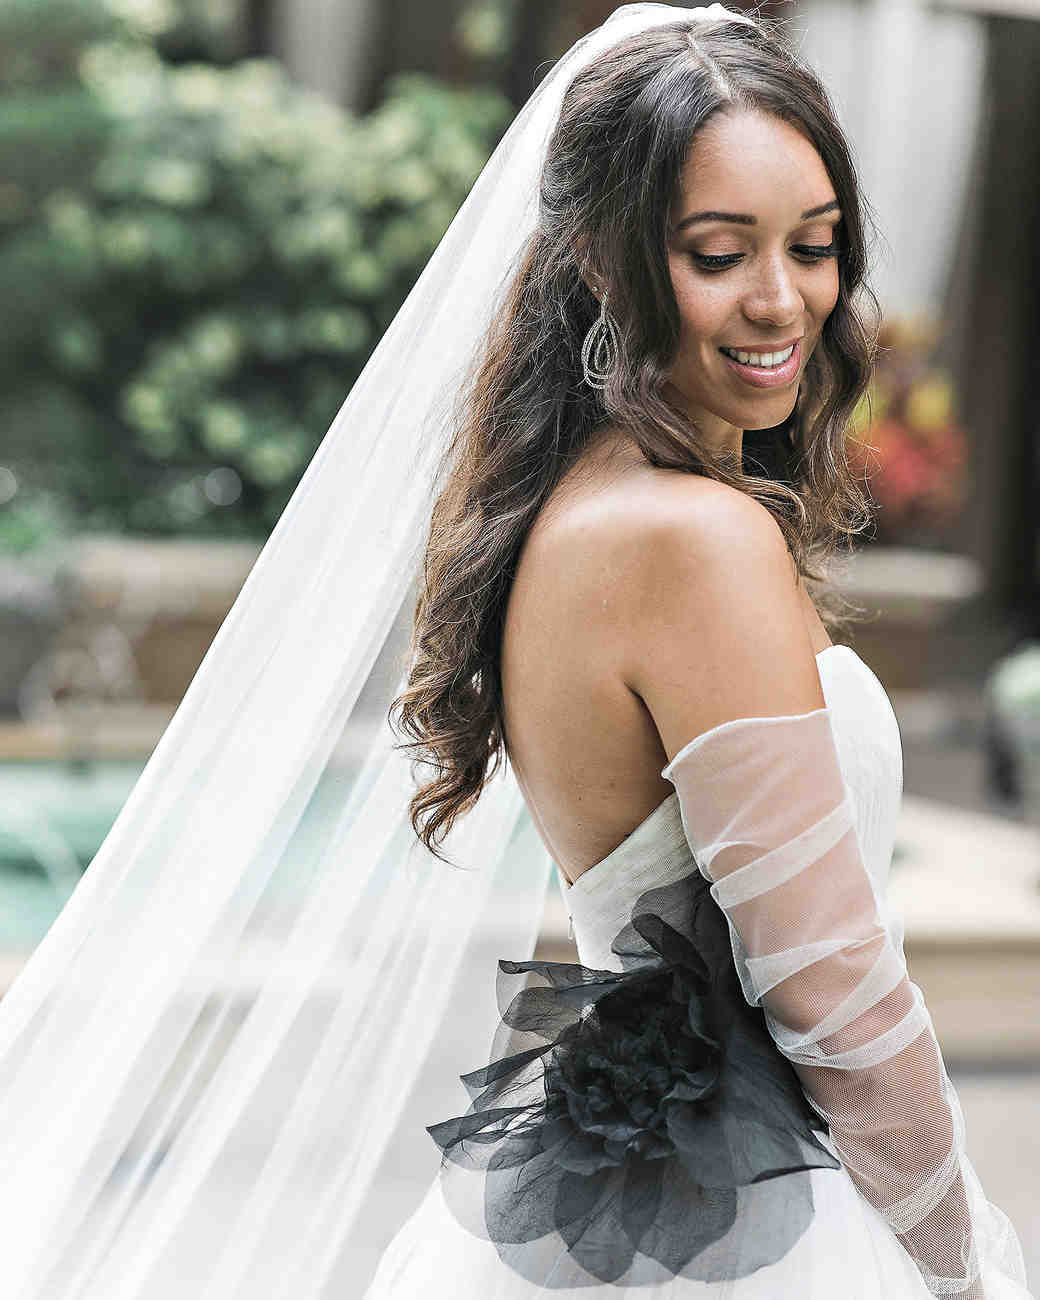 danielle kevin wedding bride dress and veil